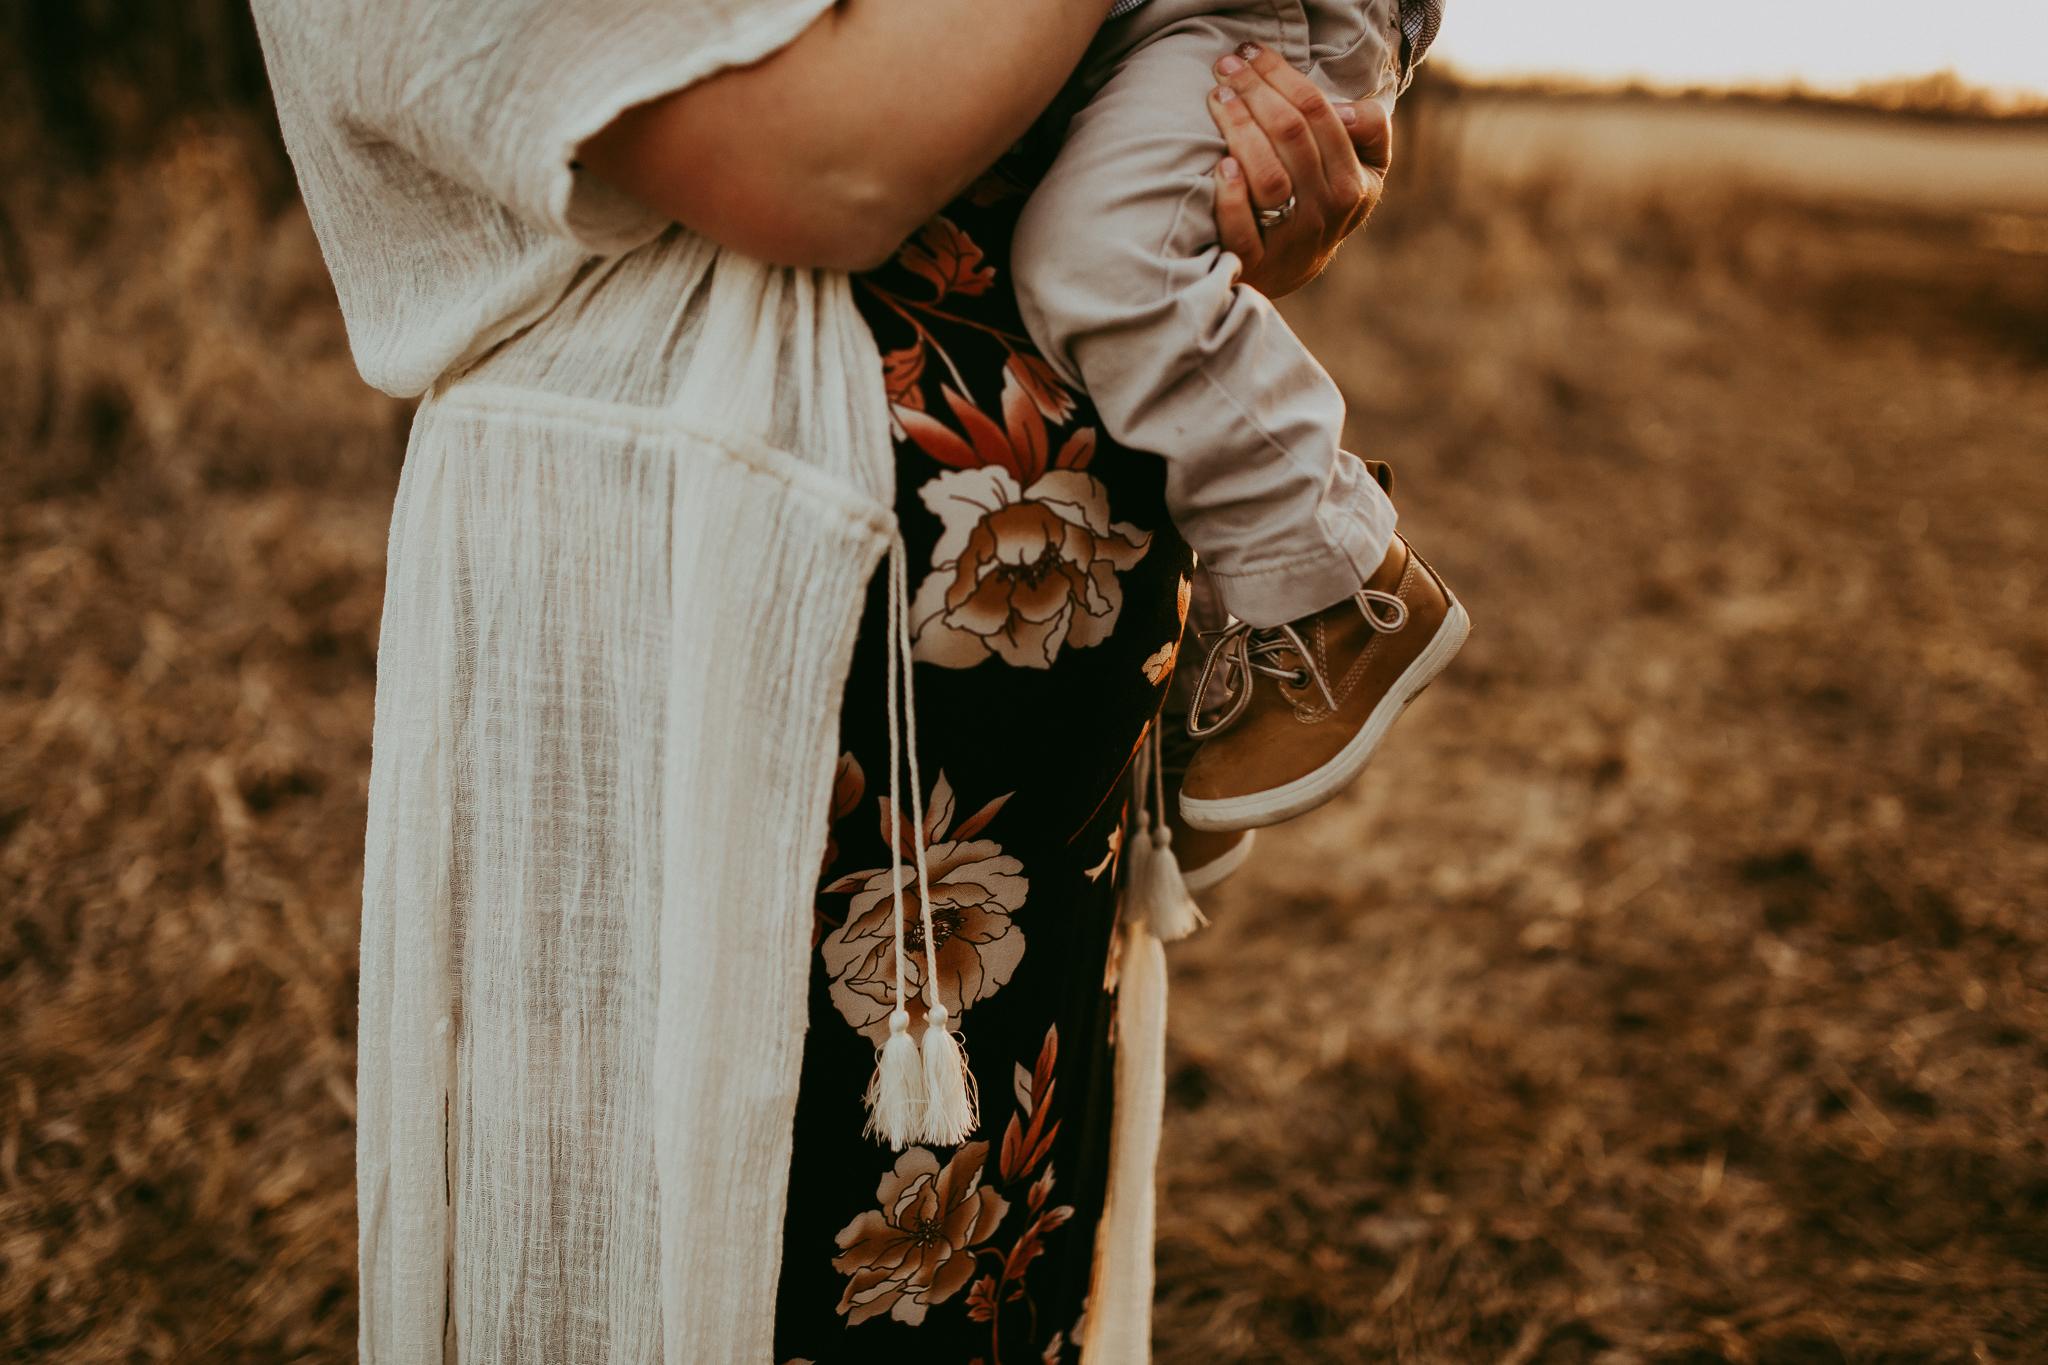 Alina-Joy-Photography-Cold-Lake-Maternity-Photographer-Josee-80.jpg